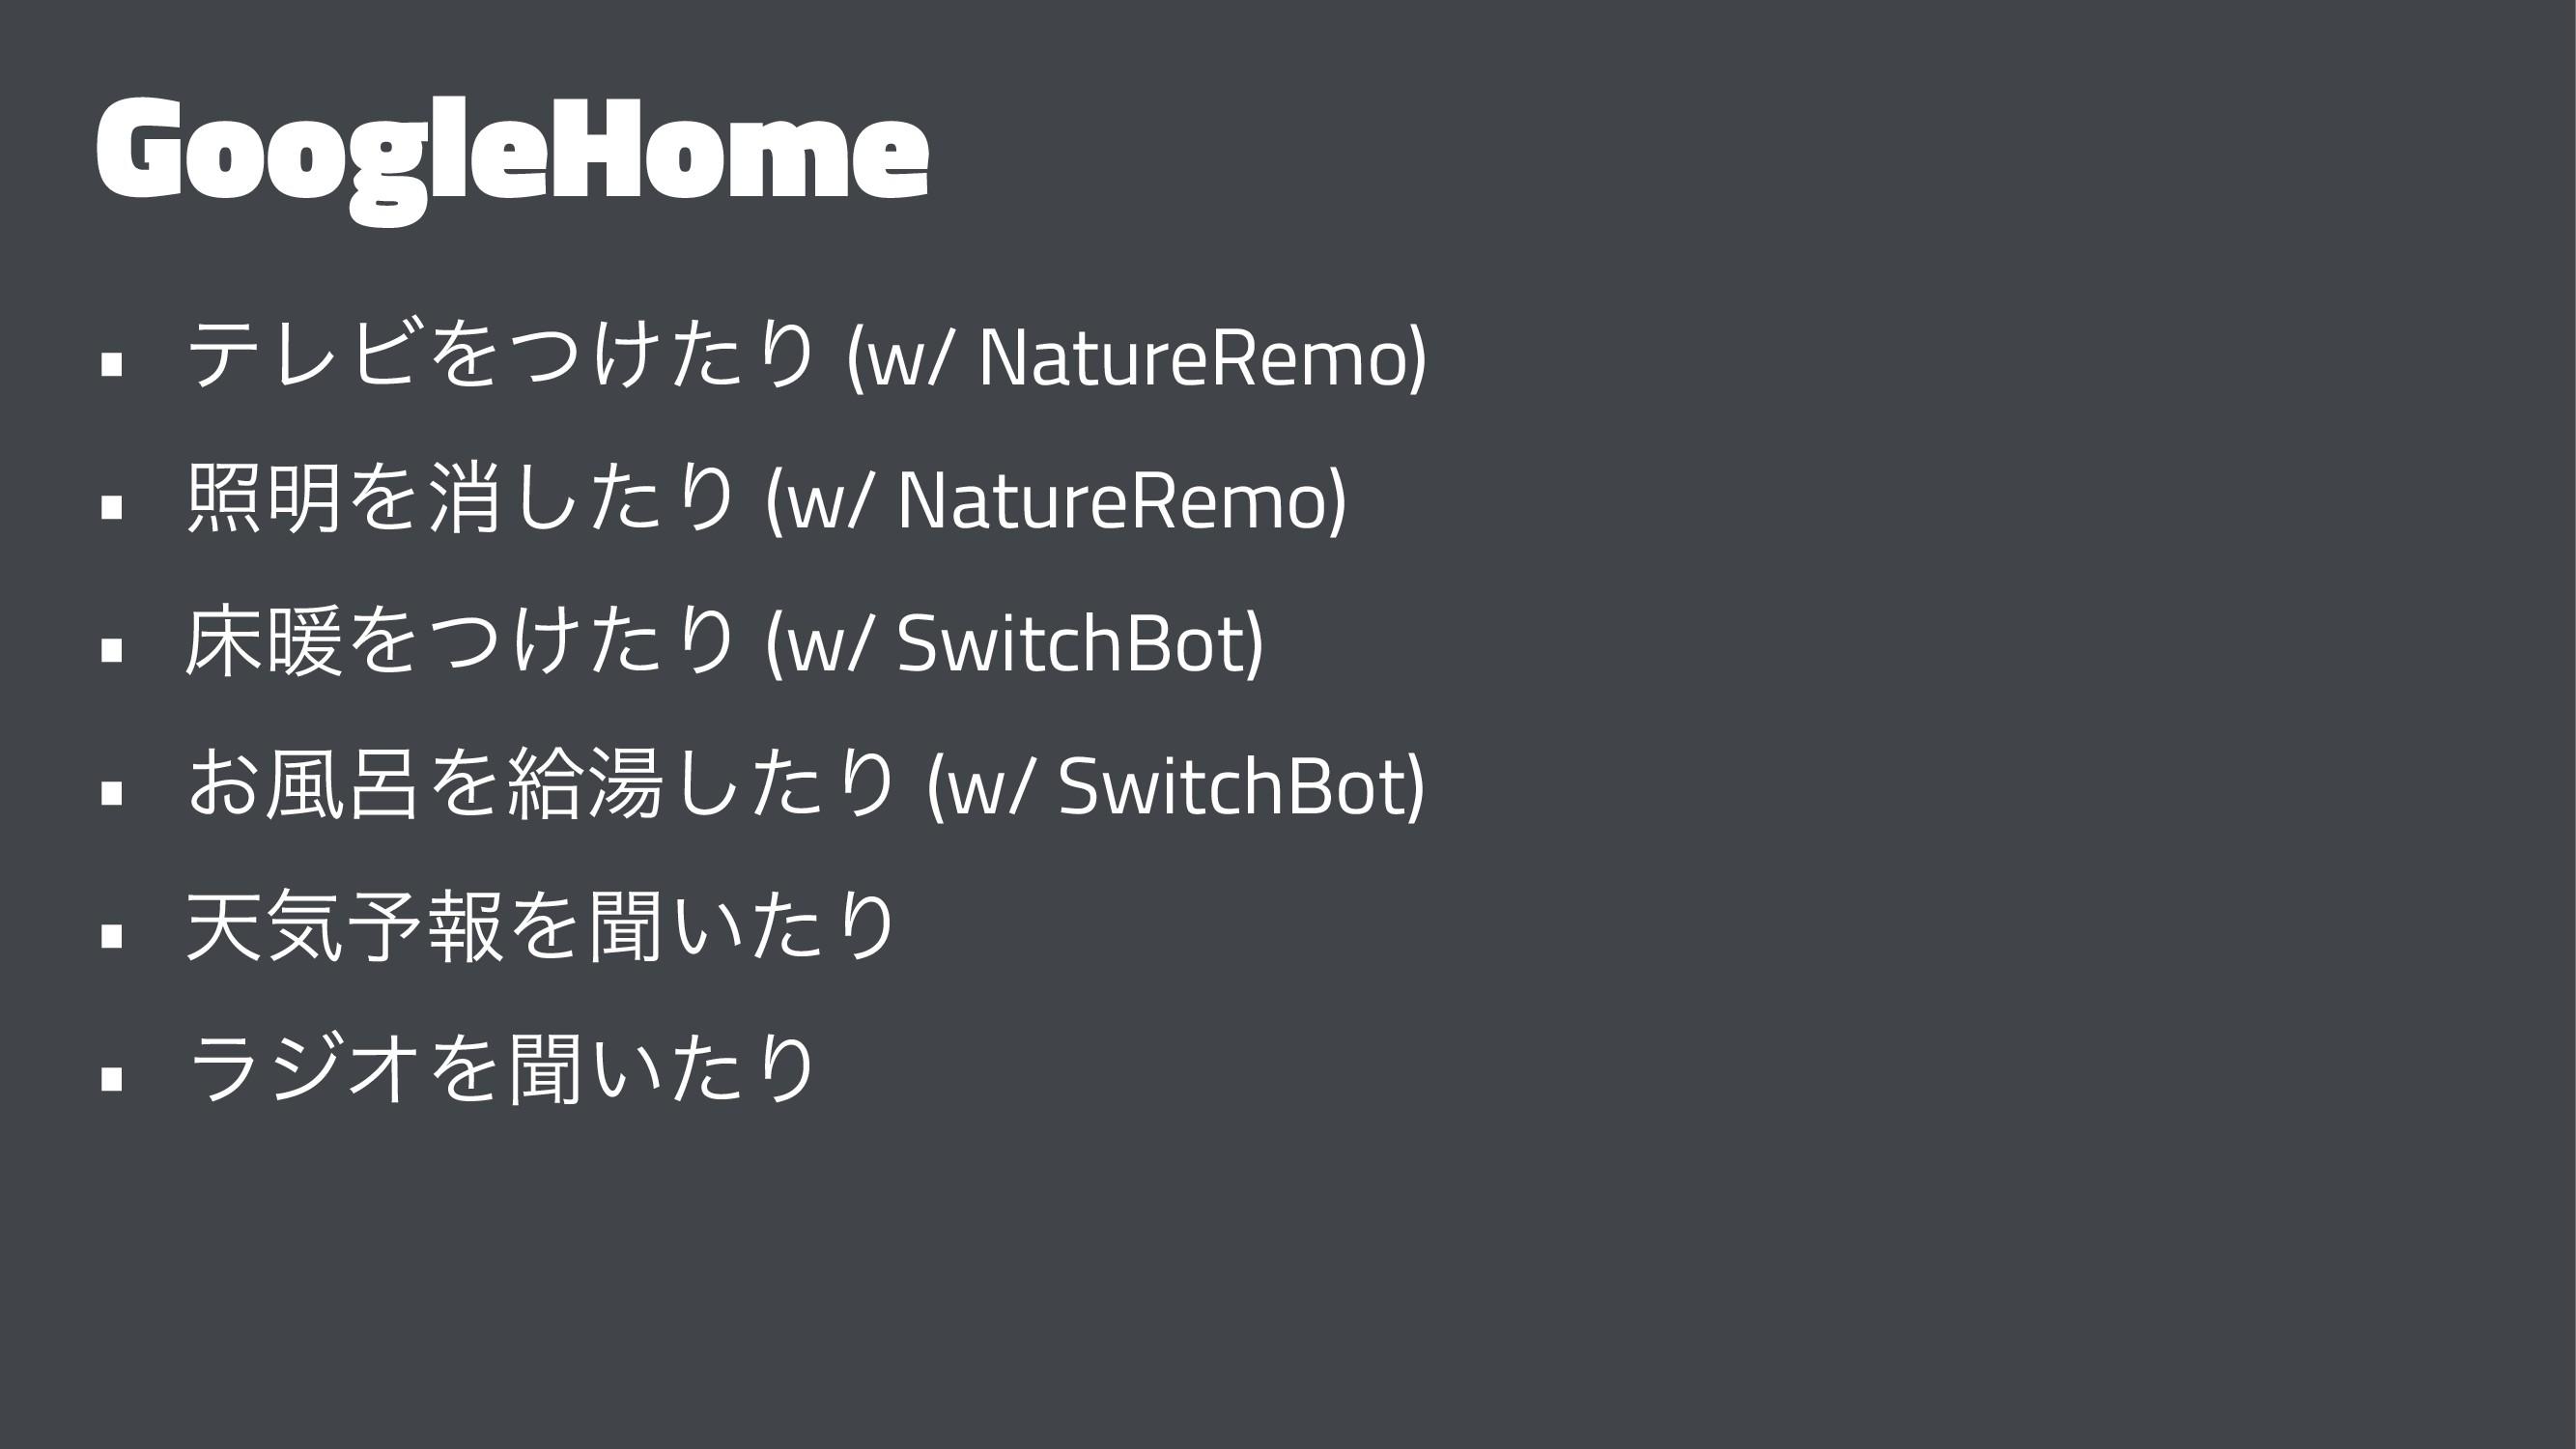 GoogleHome • ςϨϏΛ͚ͭͨΓ (w/ NatureRemo) • র໌Λফͨ͠Γ...